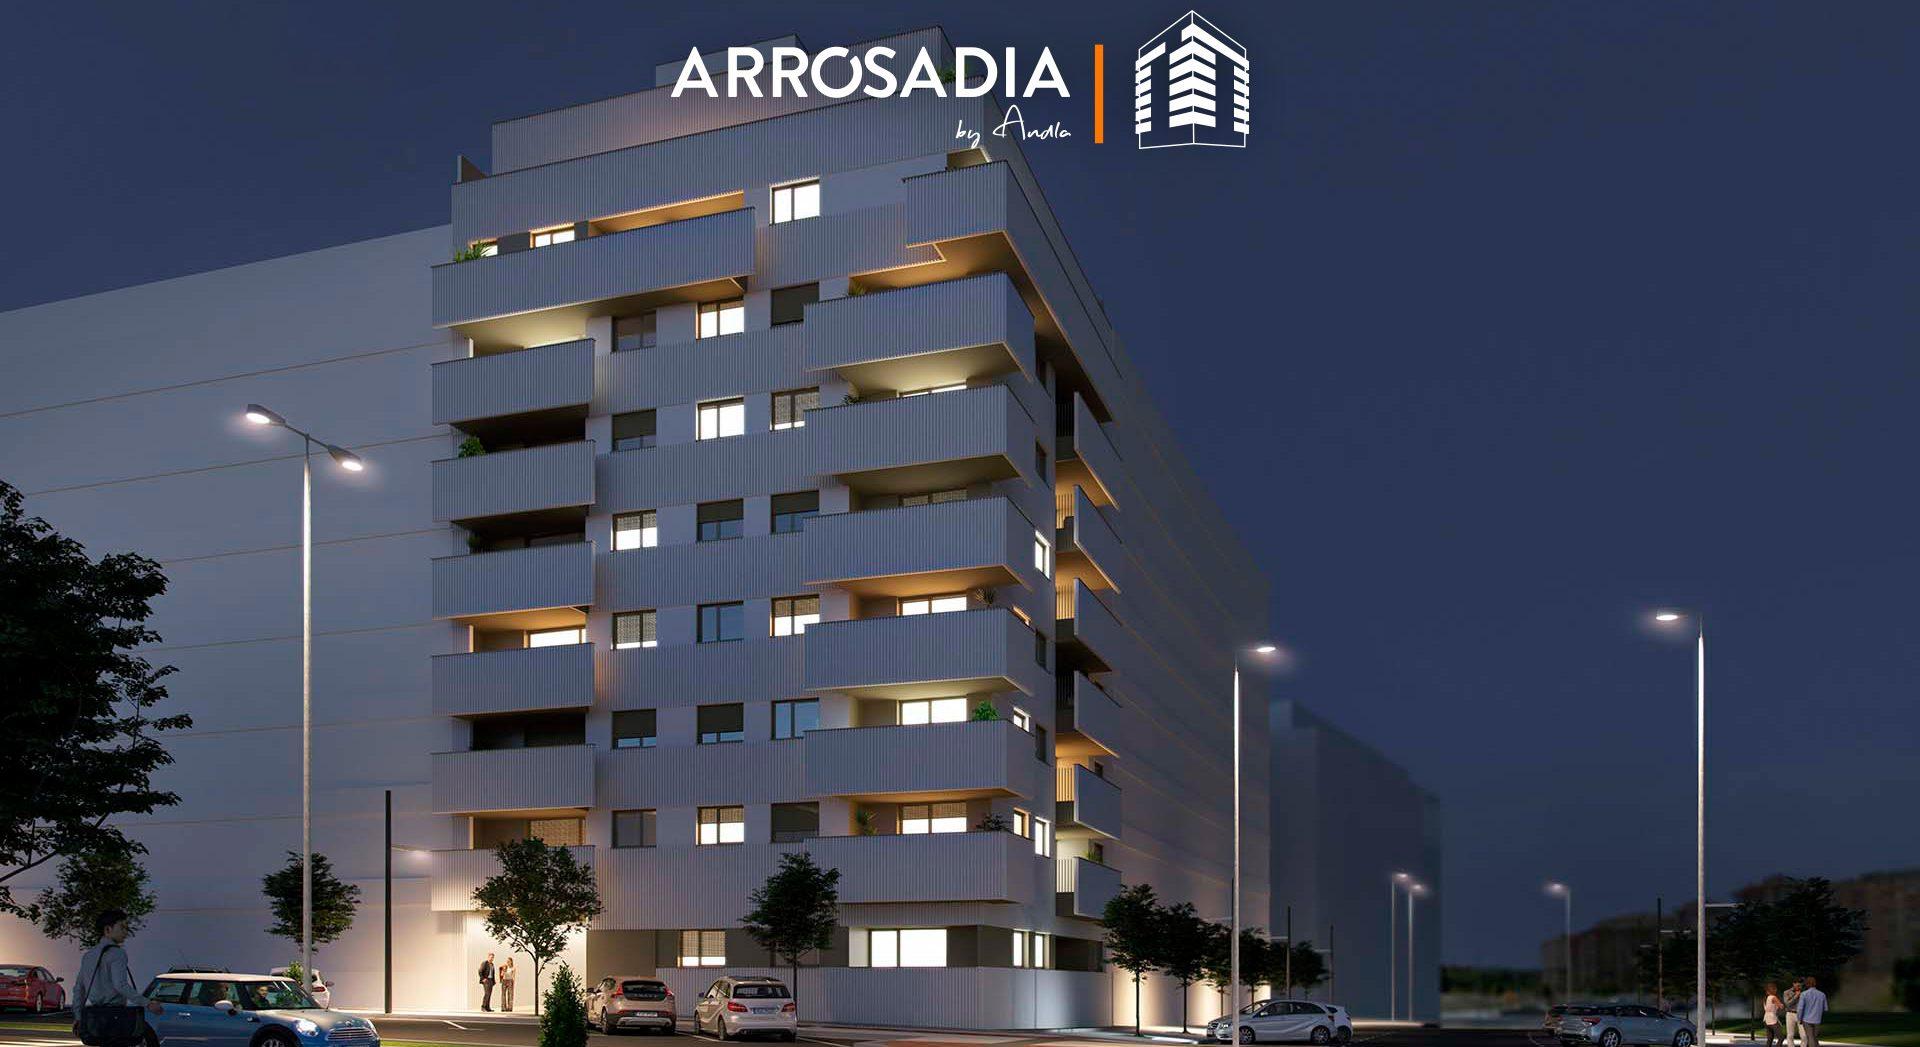 ANDIA_ARROSADIA_NOCHE-slide-1-1920x1047